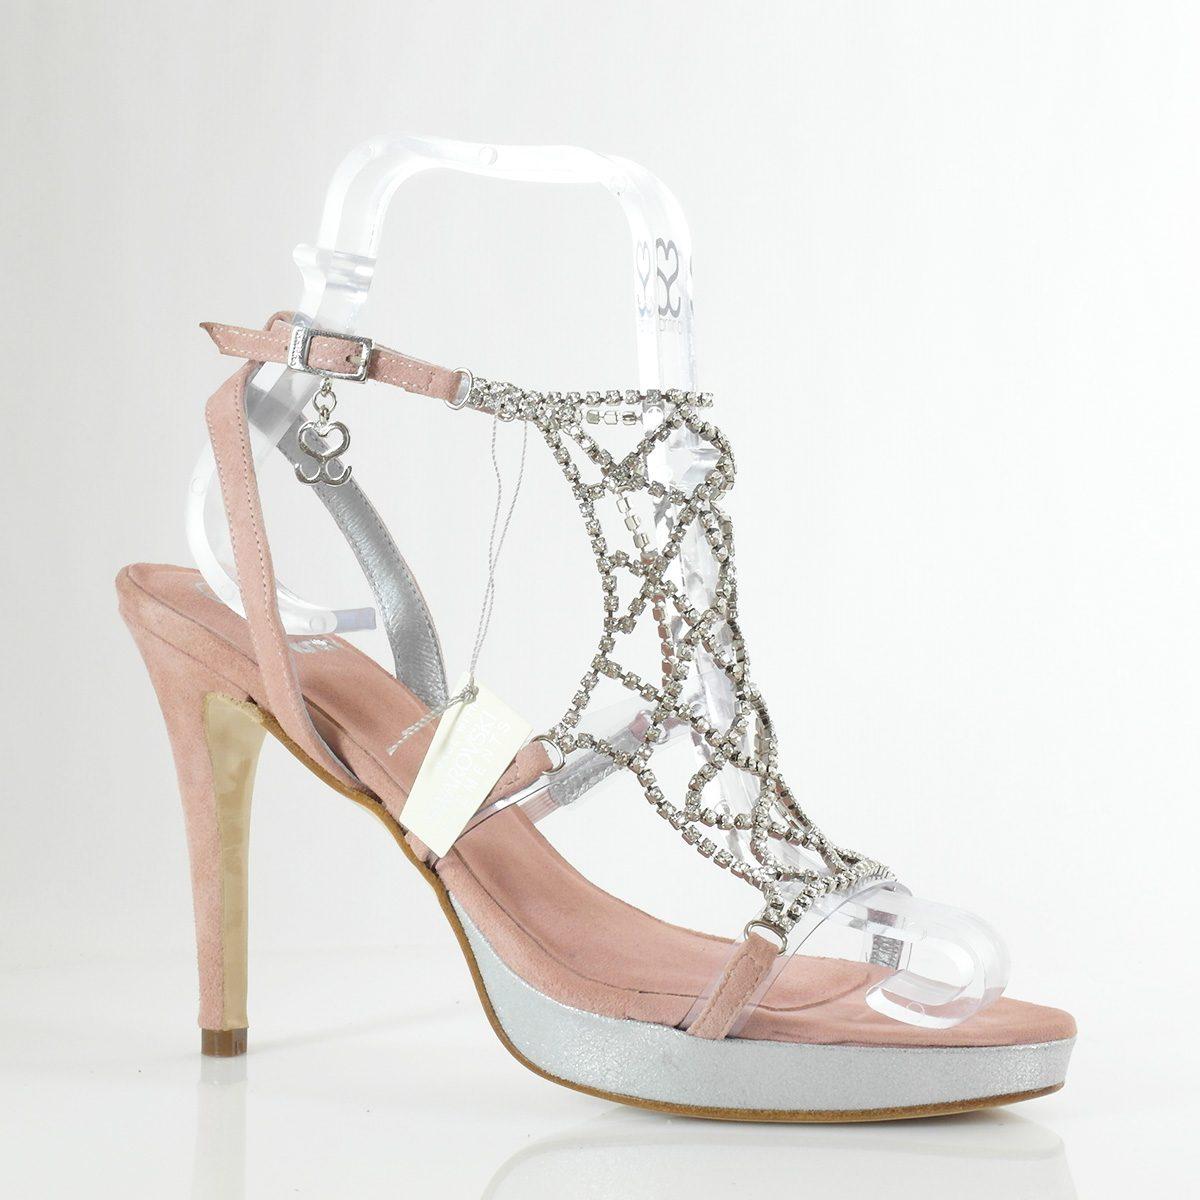 SANDALIA SWAROVSKI MOD.1011 (11cm) - zapatos personalizados fiesta